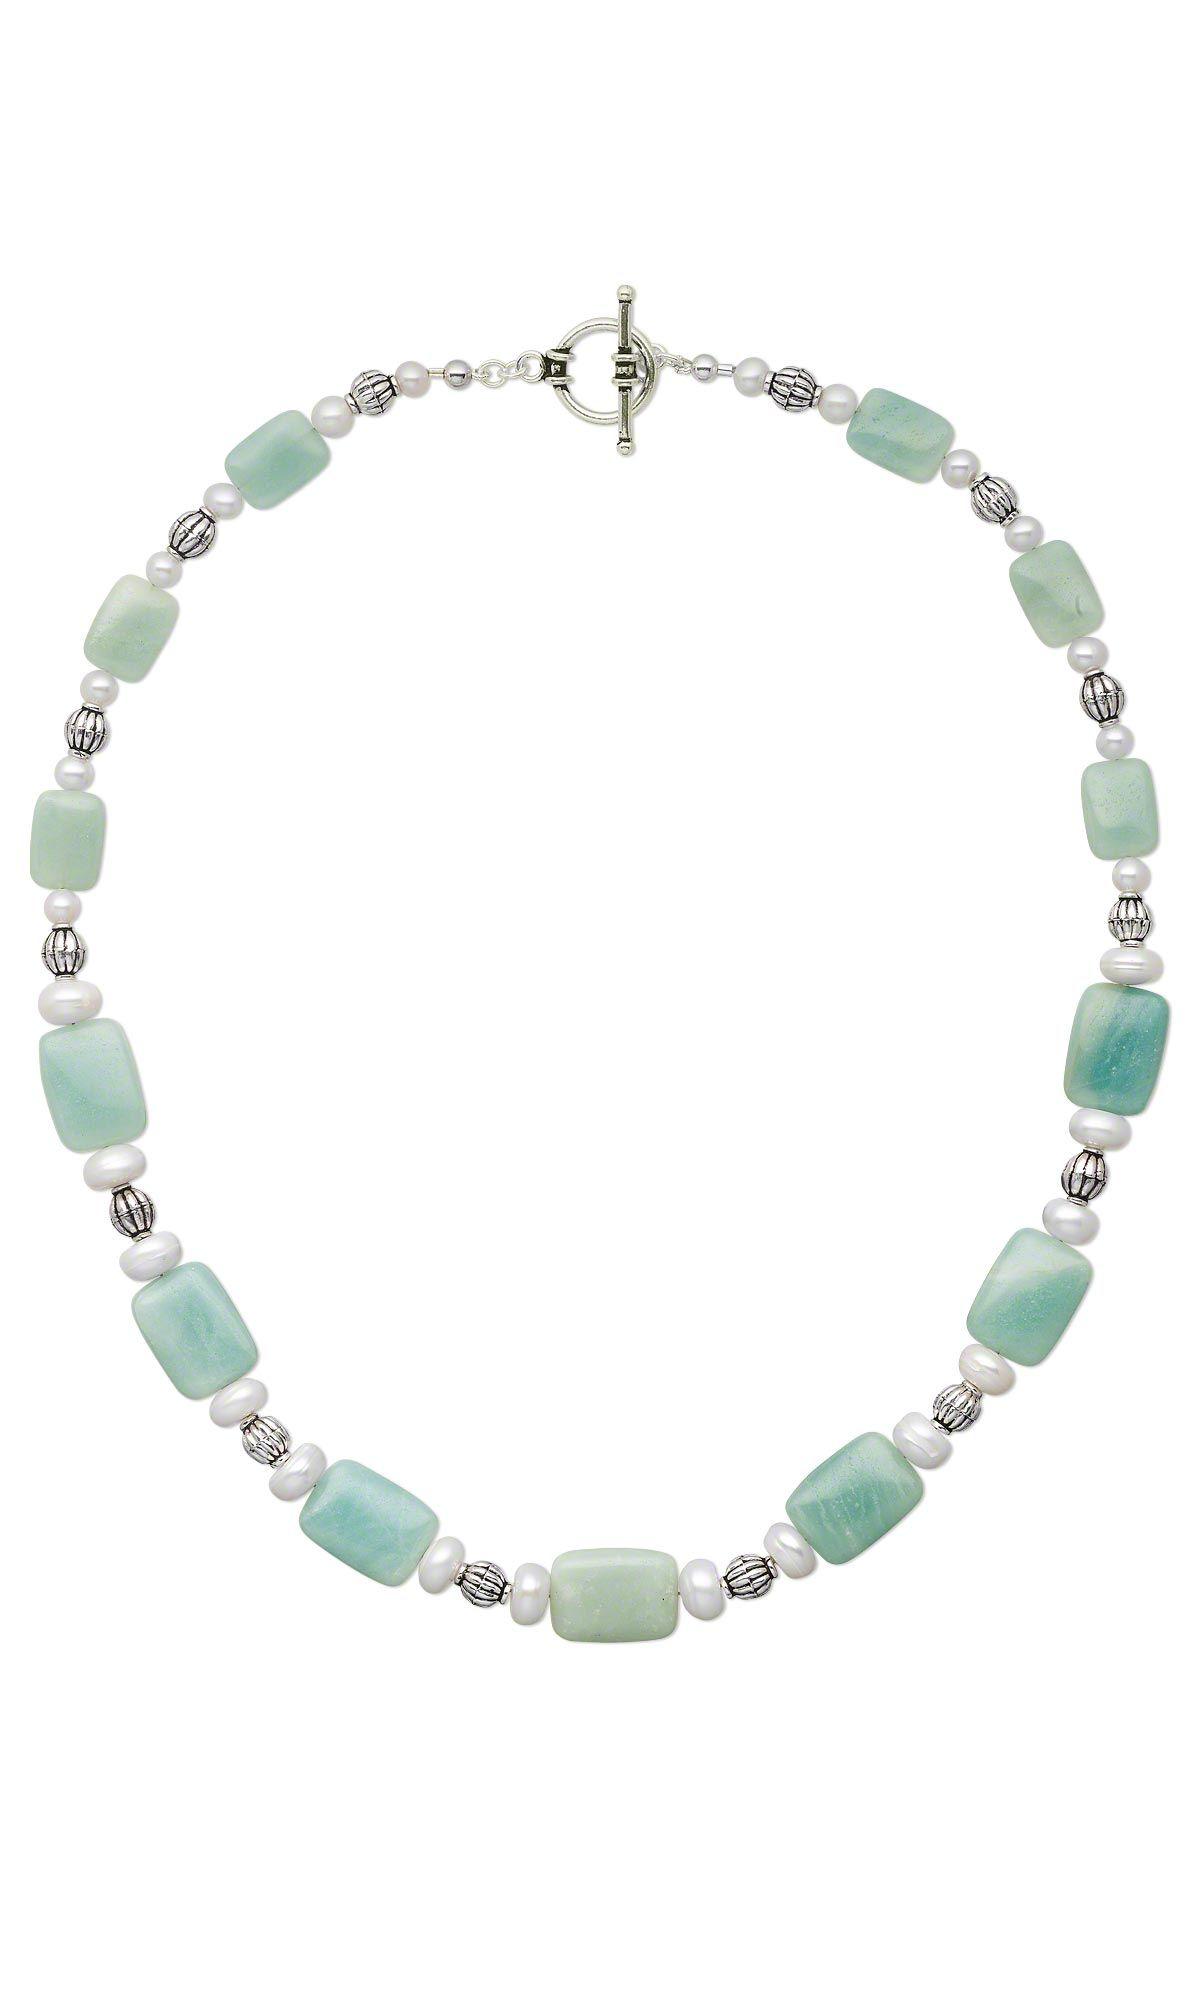 DIY Jewelry Design - Single-Strand Necklace with Amazonite ...